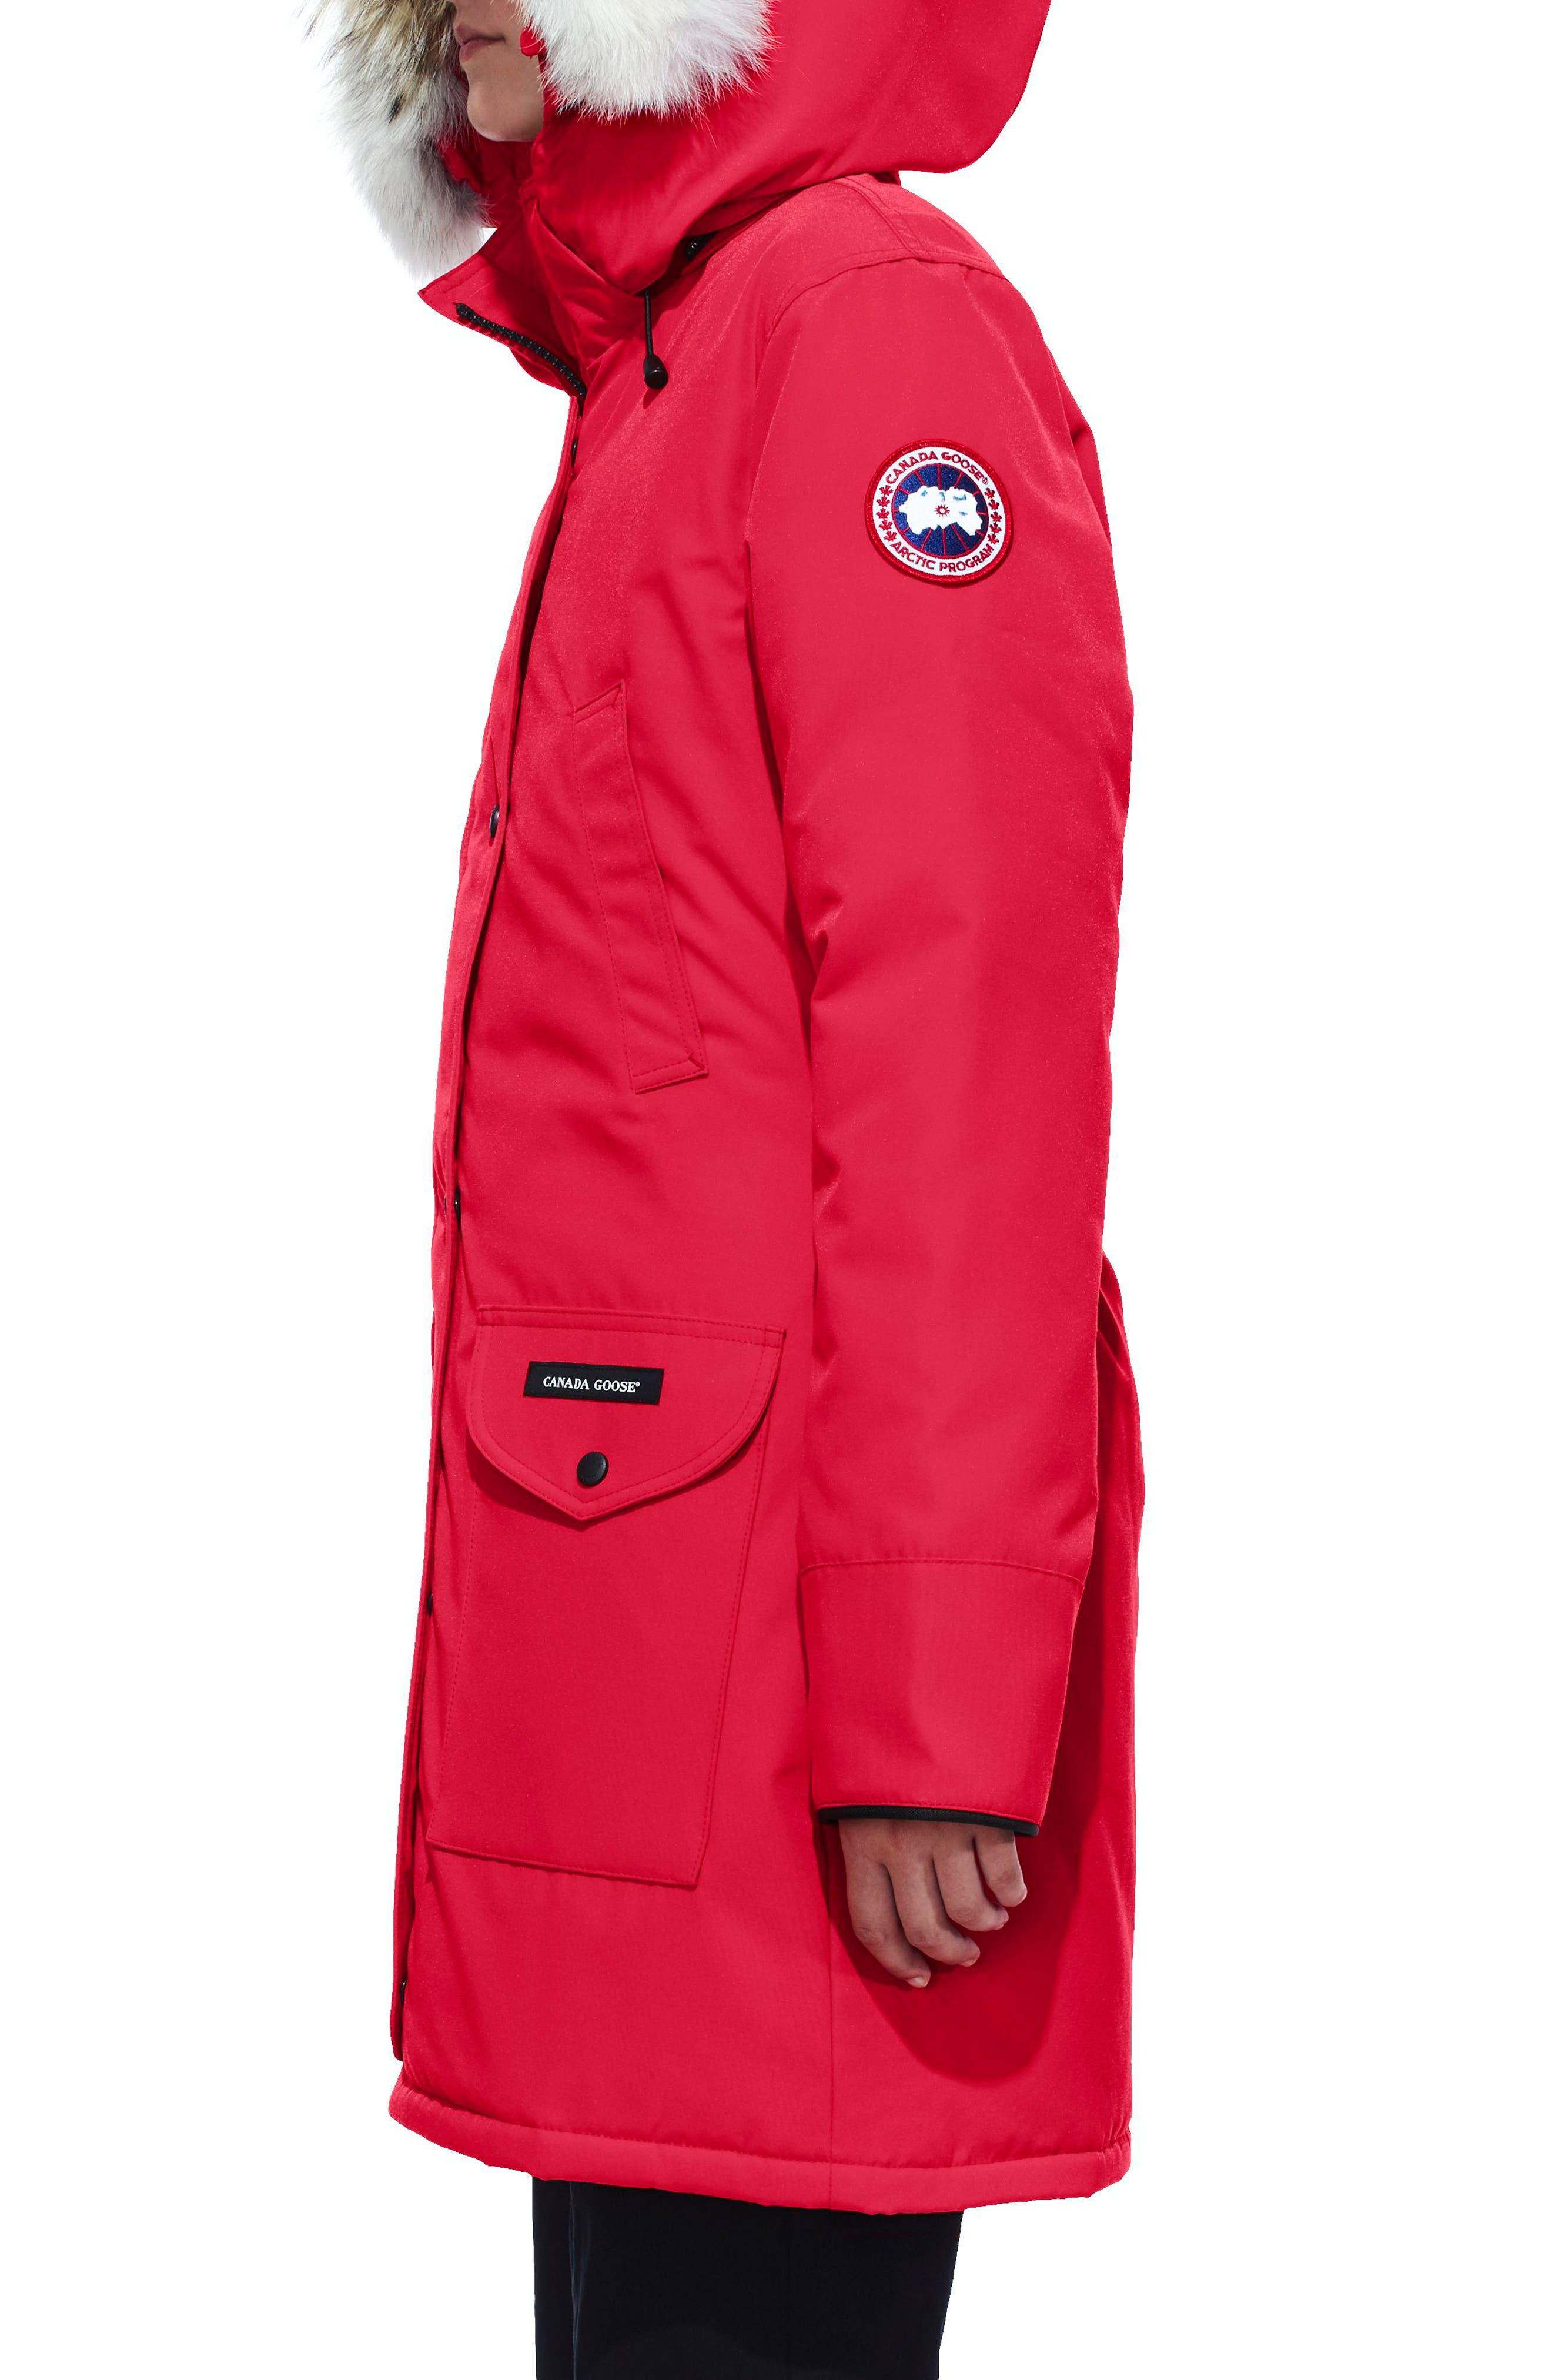 d5fe984c510 Women's Canada Goose Coats & Jackets | Nordstrom